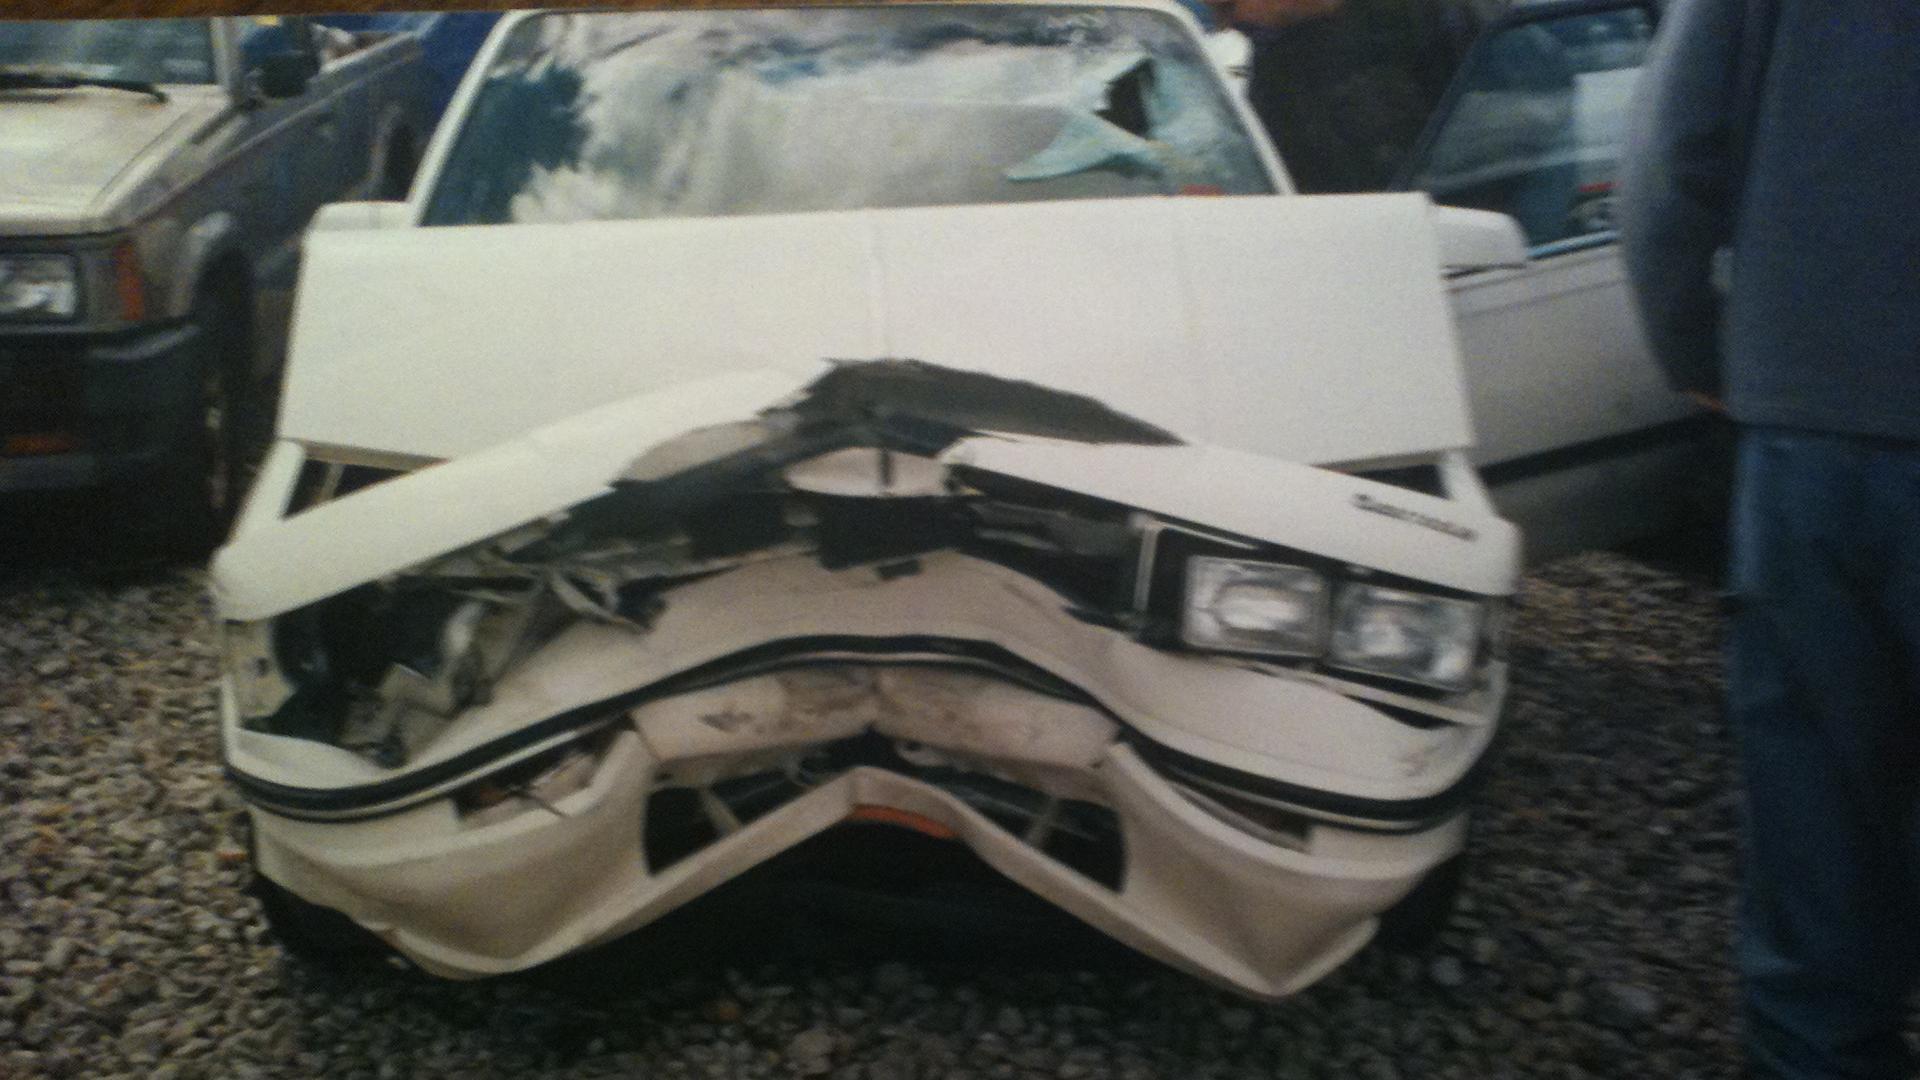 accident_car5.jpg